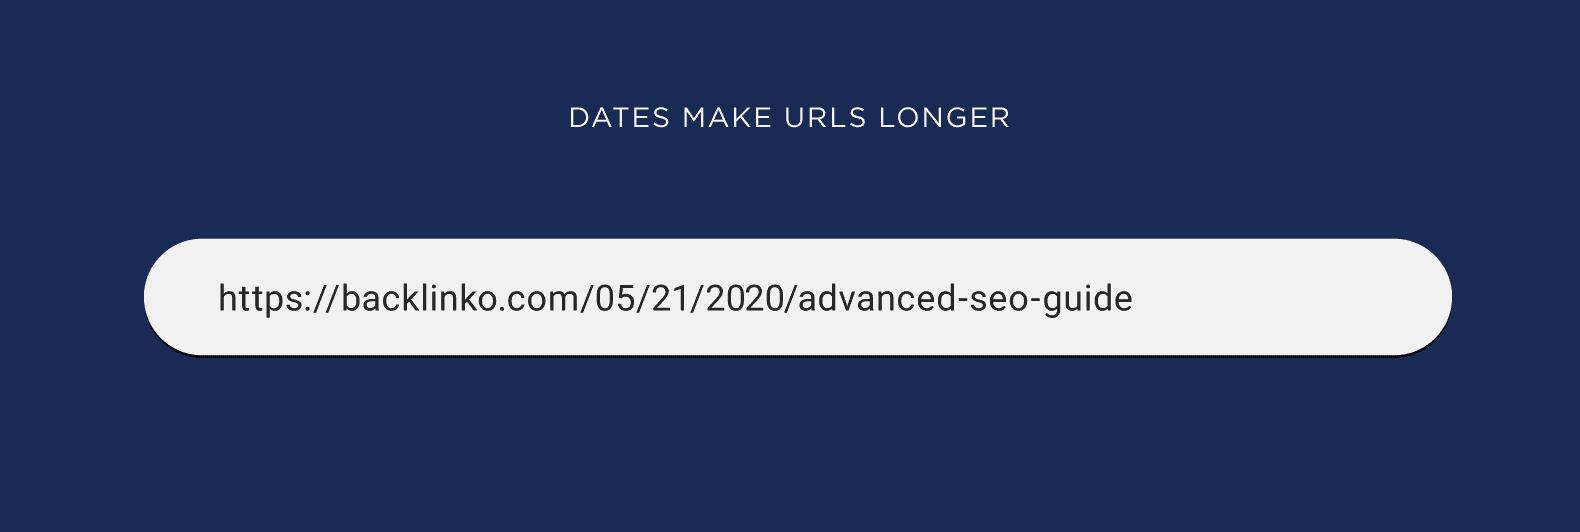 Dates Make URLs Longer Visual